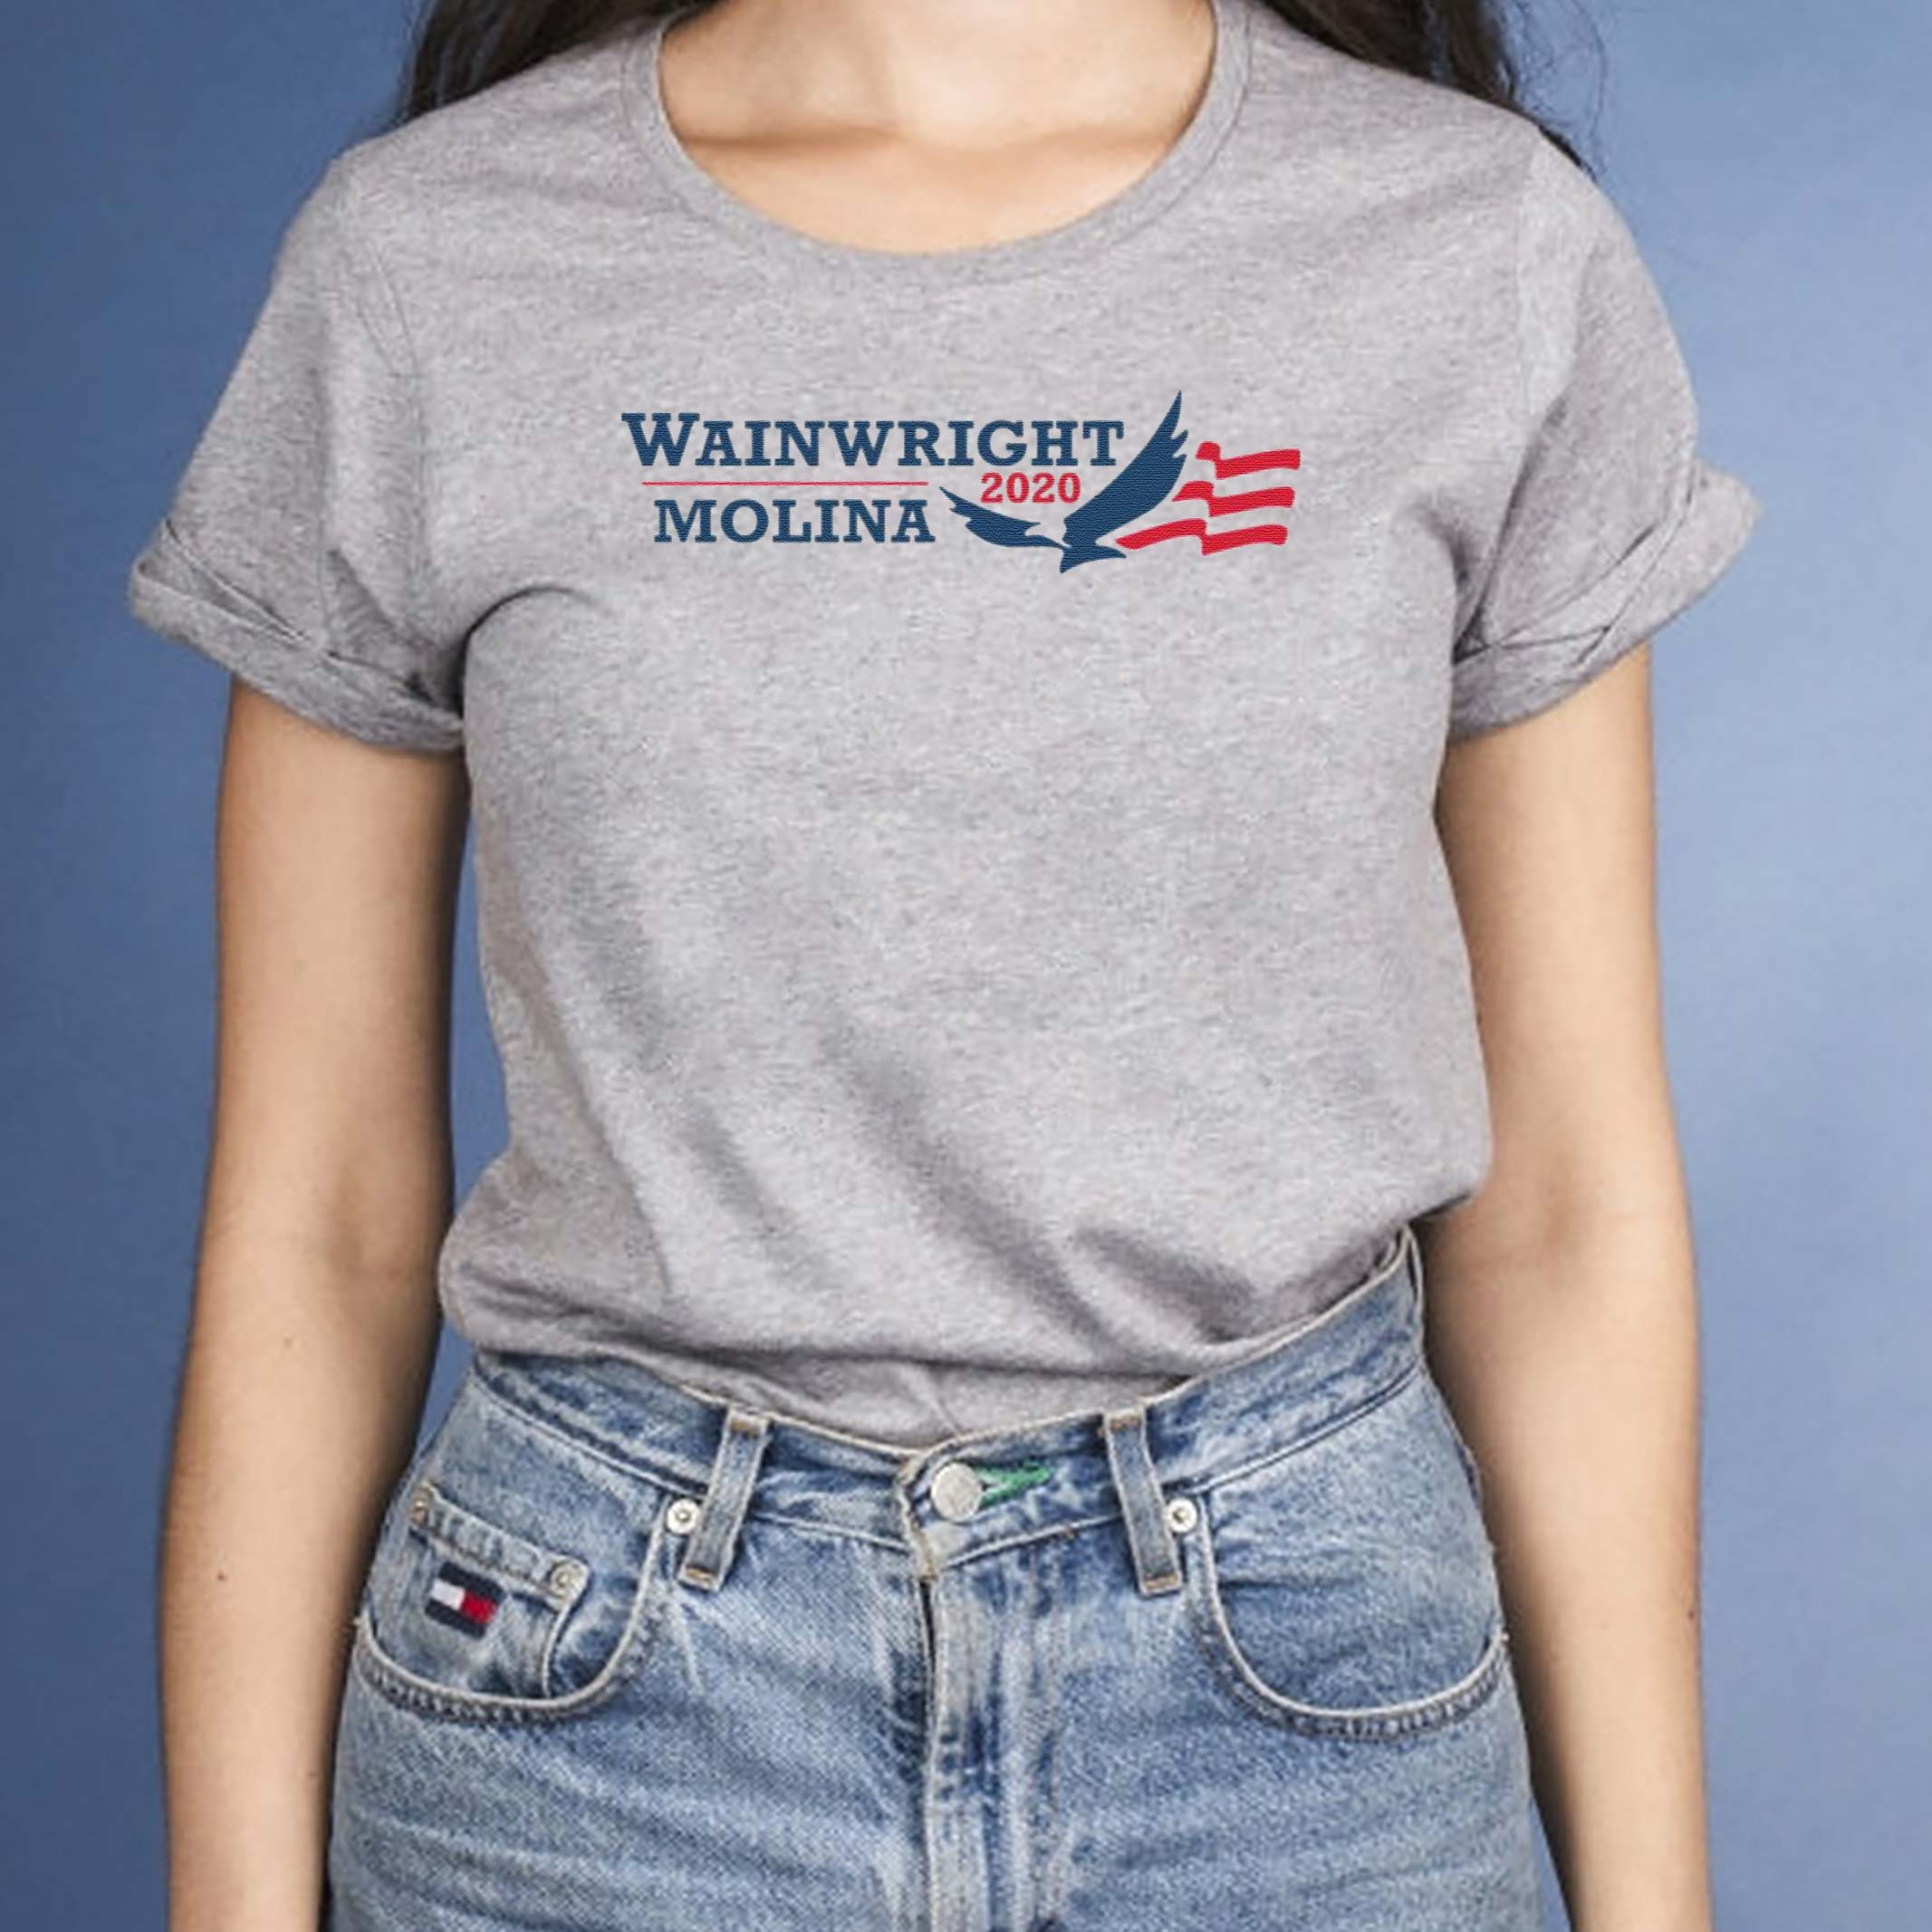 Wainwright-Molina-2020-T-Shirts